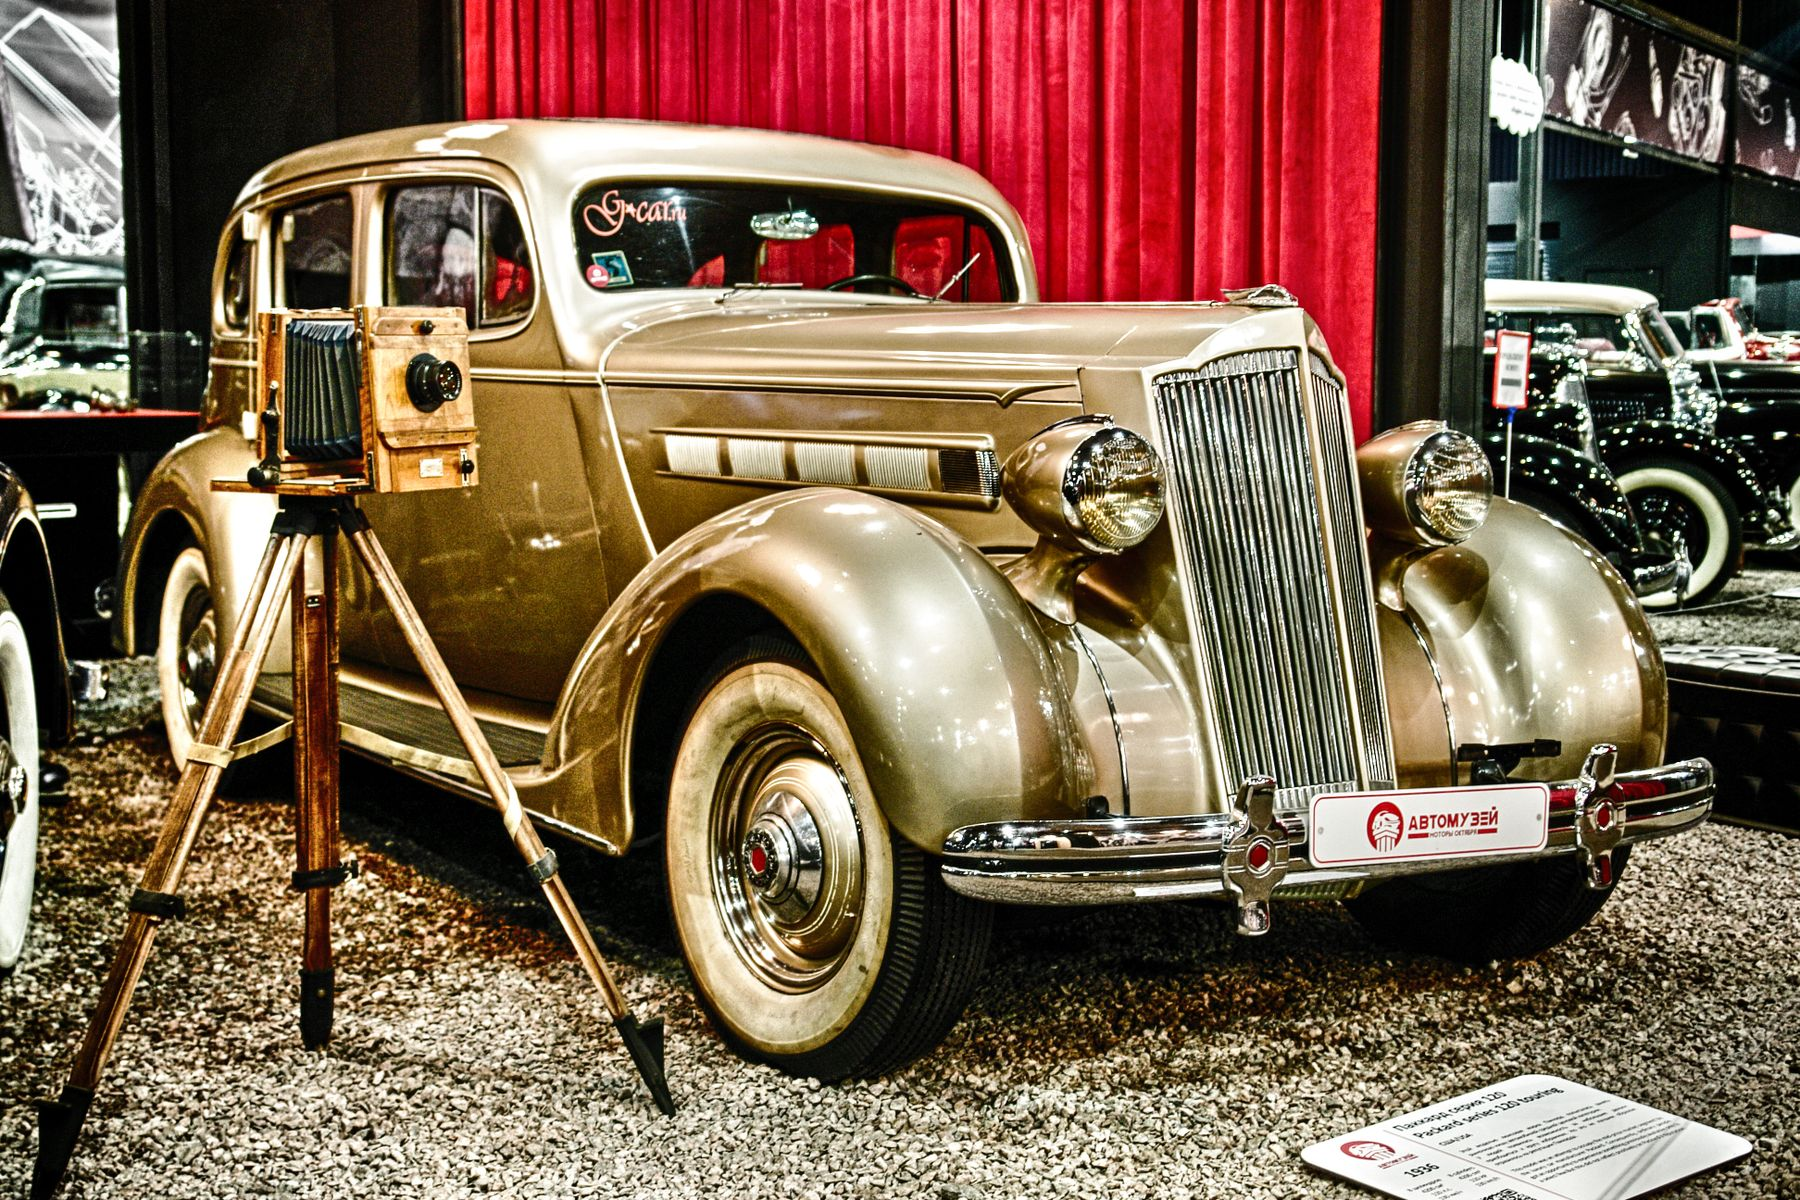 Packard ретро авто музей мотор октября вдка пиво бабы